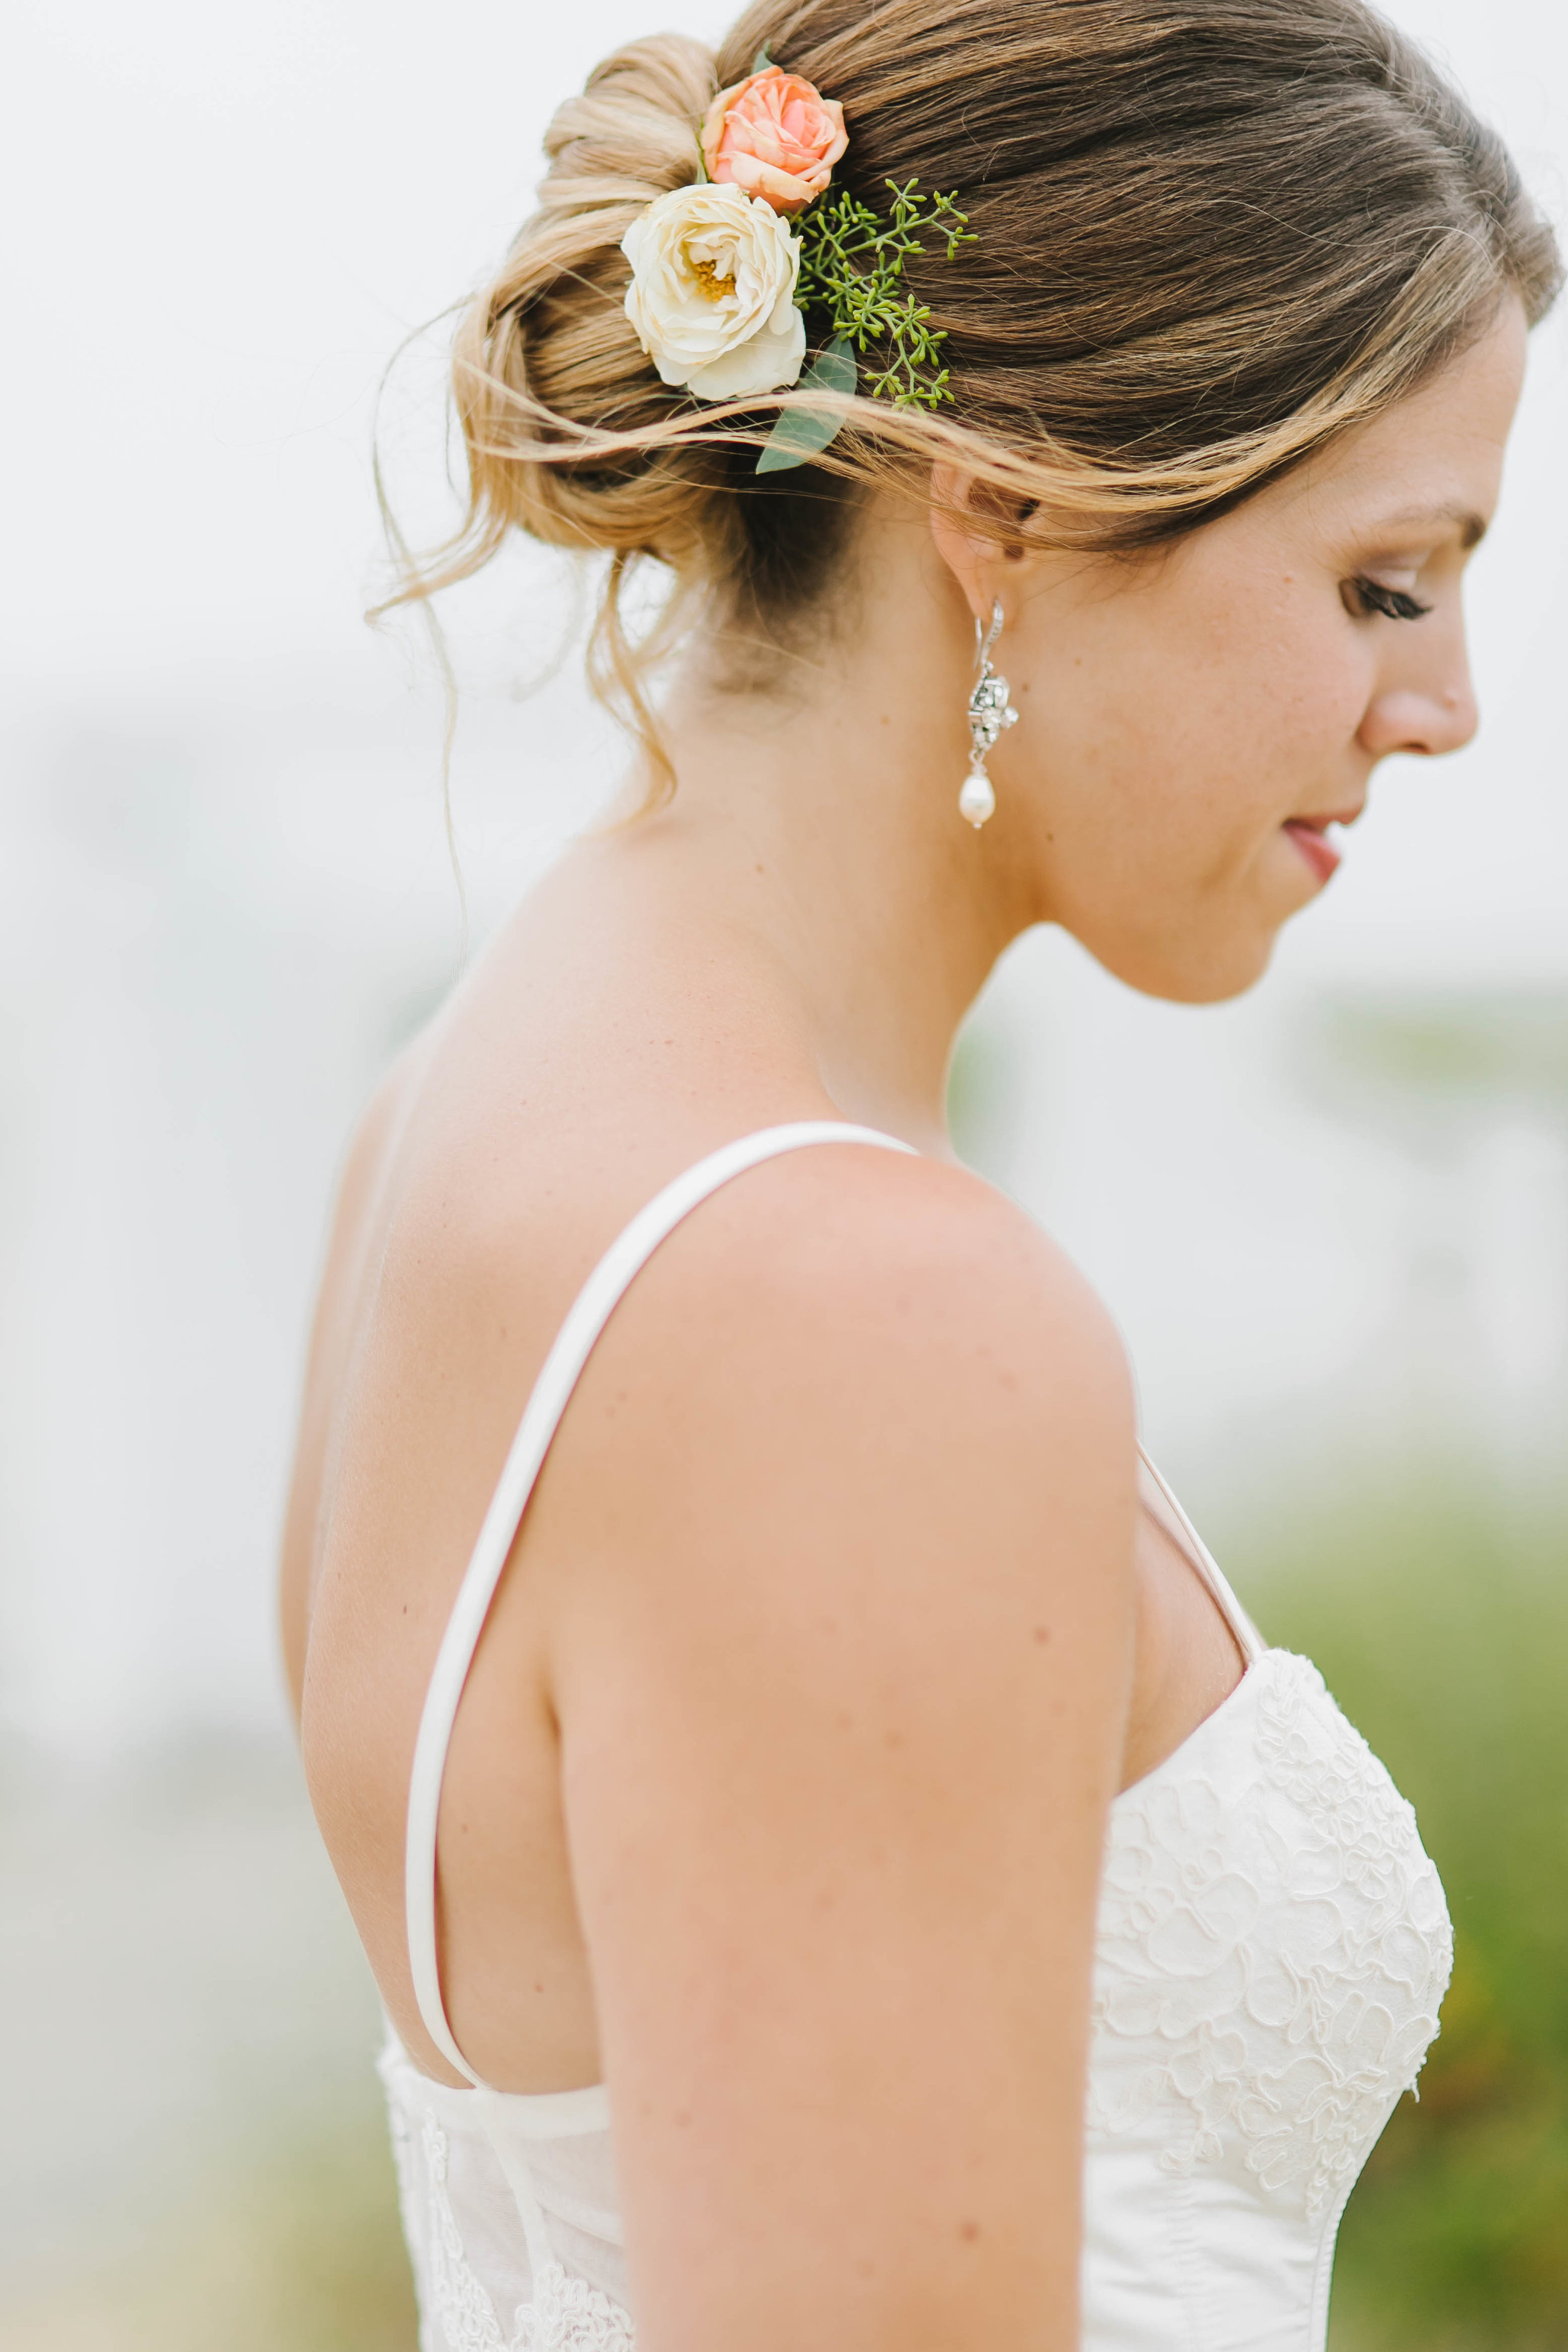 Chatham Bars Inn Cape Cod Chatham MA Beach Wedding - Emily Tebbetts Photography-18.jpg